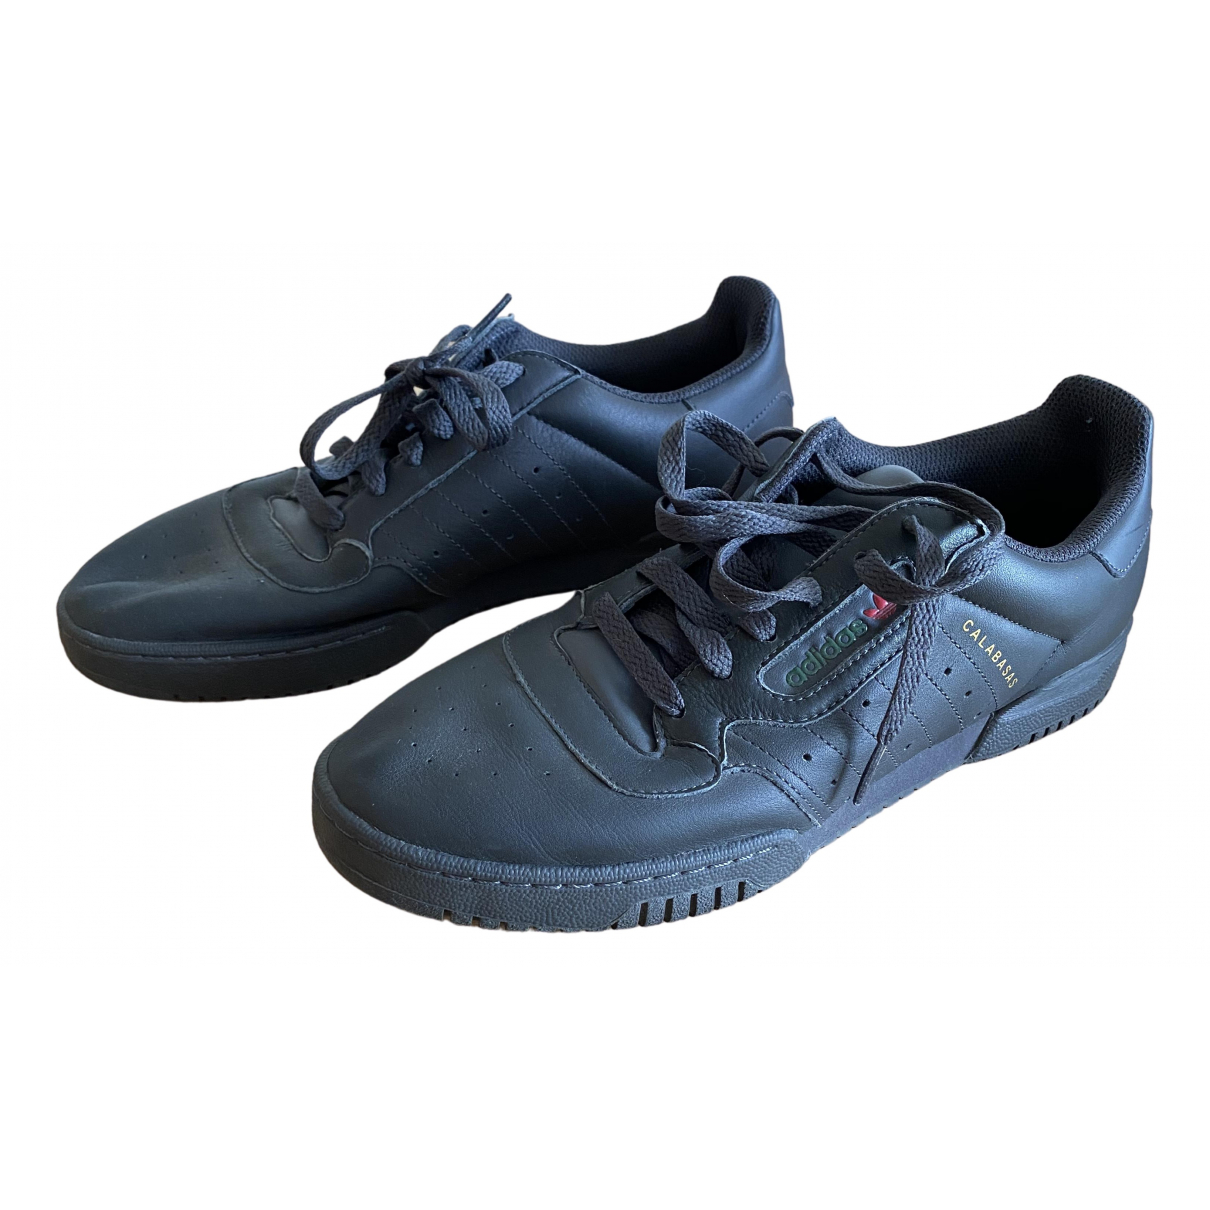 Yeezy X Adidas POWERPHASE Sneakers in  Schwarz Leder